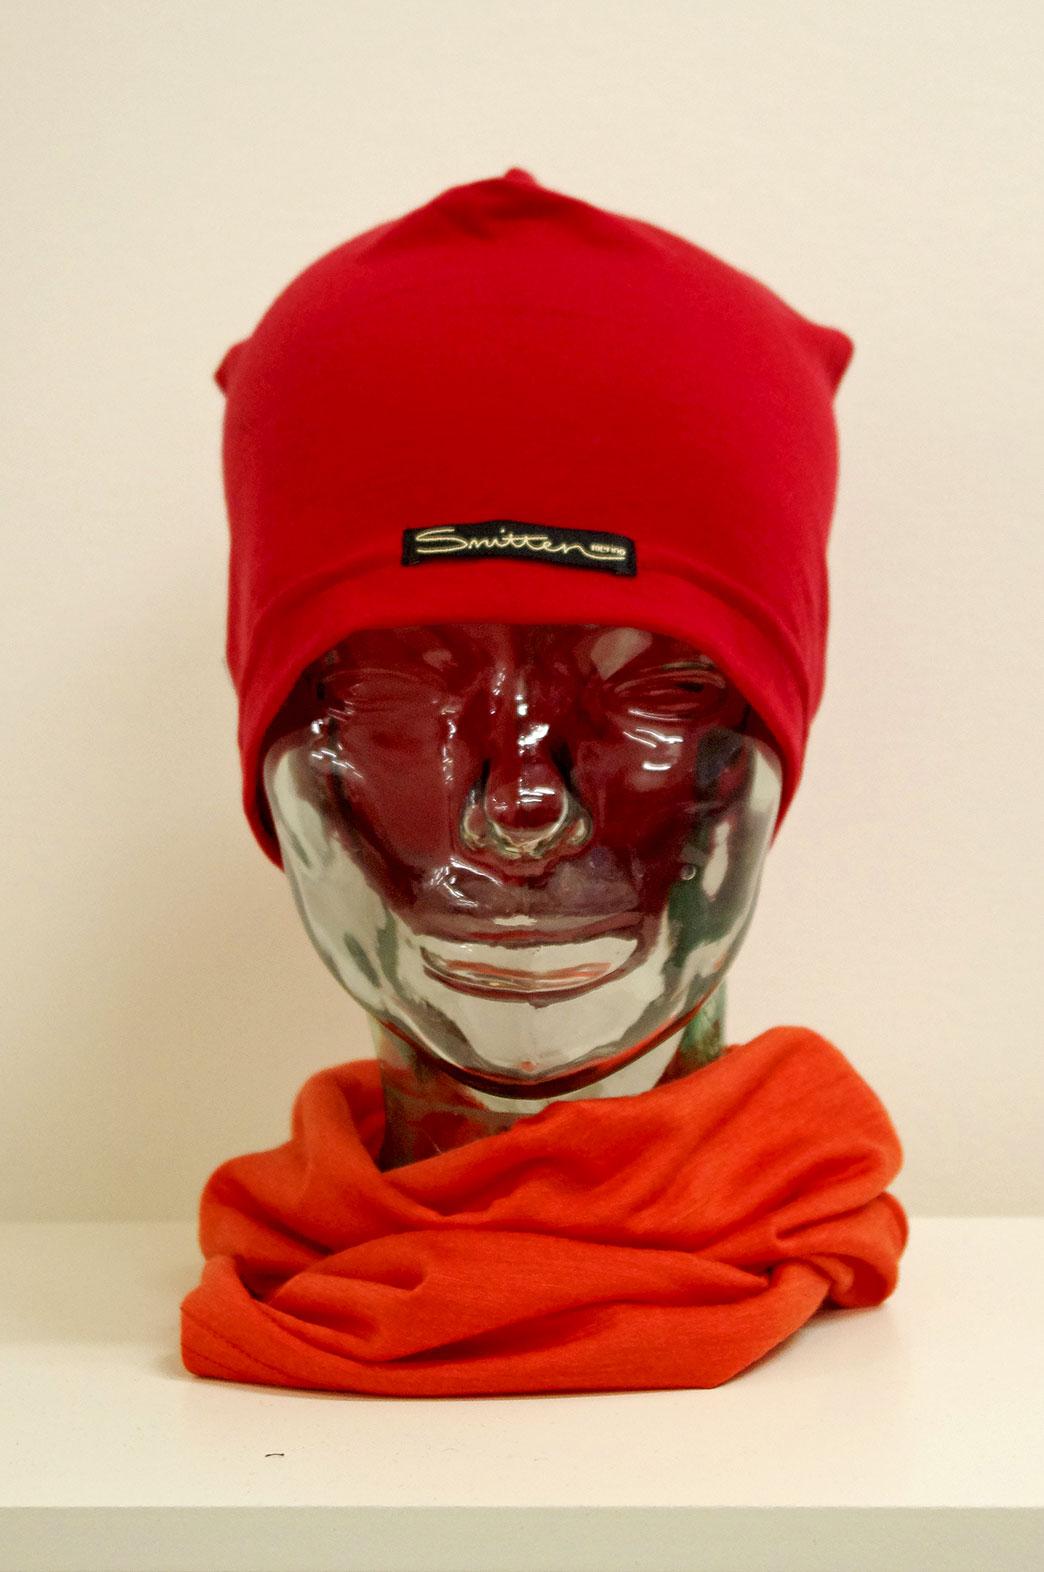 Beanie - Lightweight Skull Cap - Unisex Flame Red Lightweight Merino Wool Skull Cap Beanie - Smitten Merino Tasmania Australia